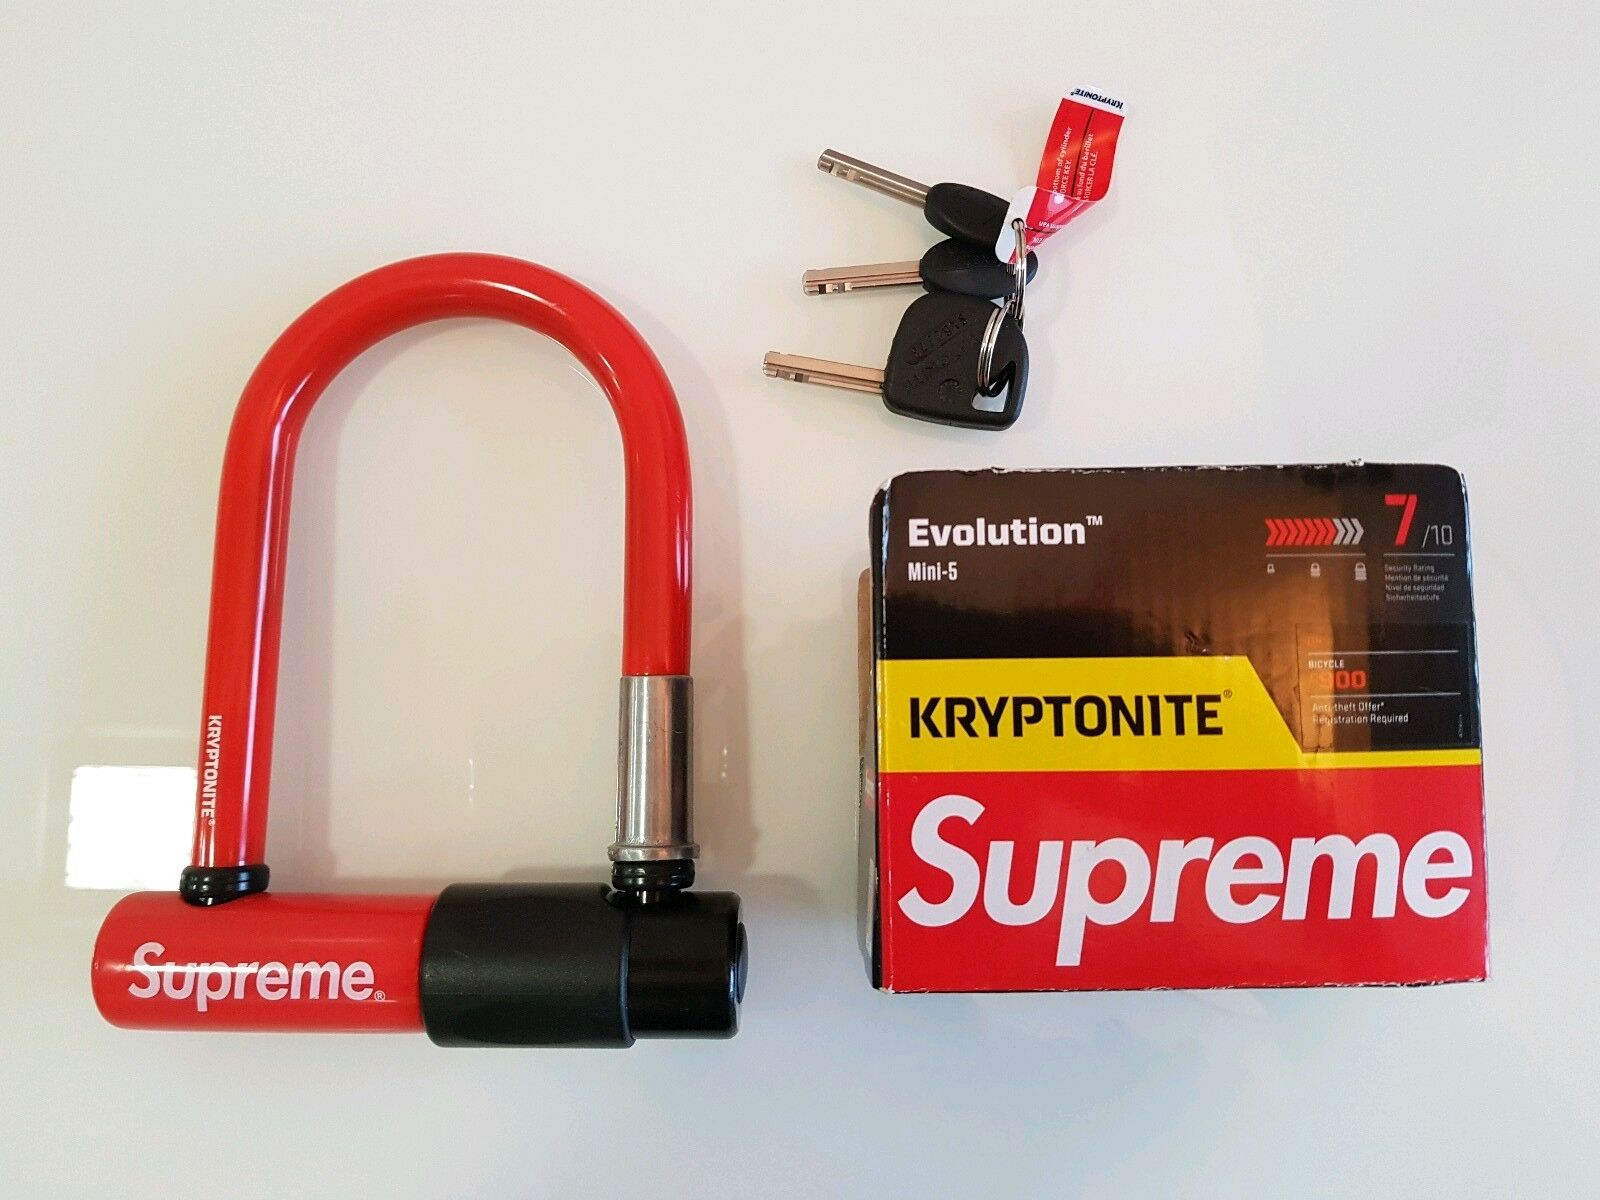 Supreme Kryptonite Evolution Mini 5 U-lock